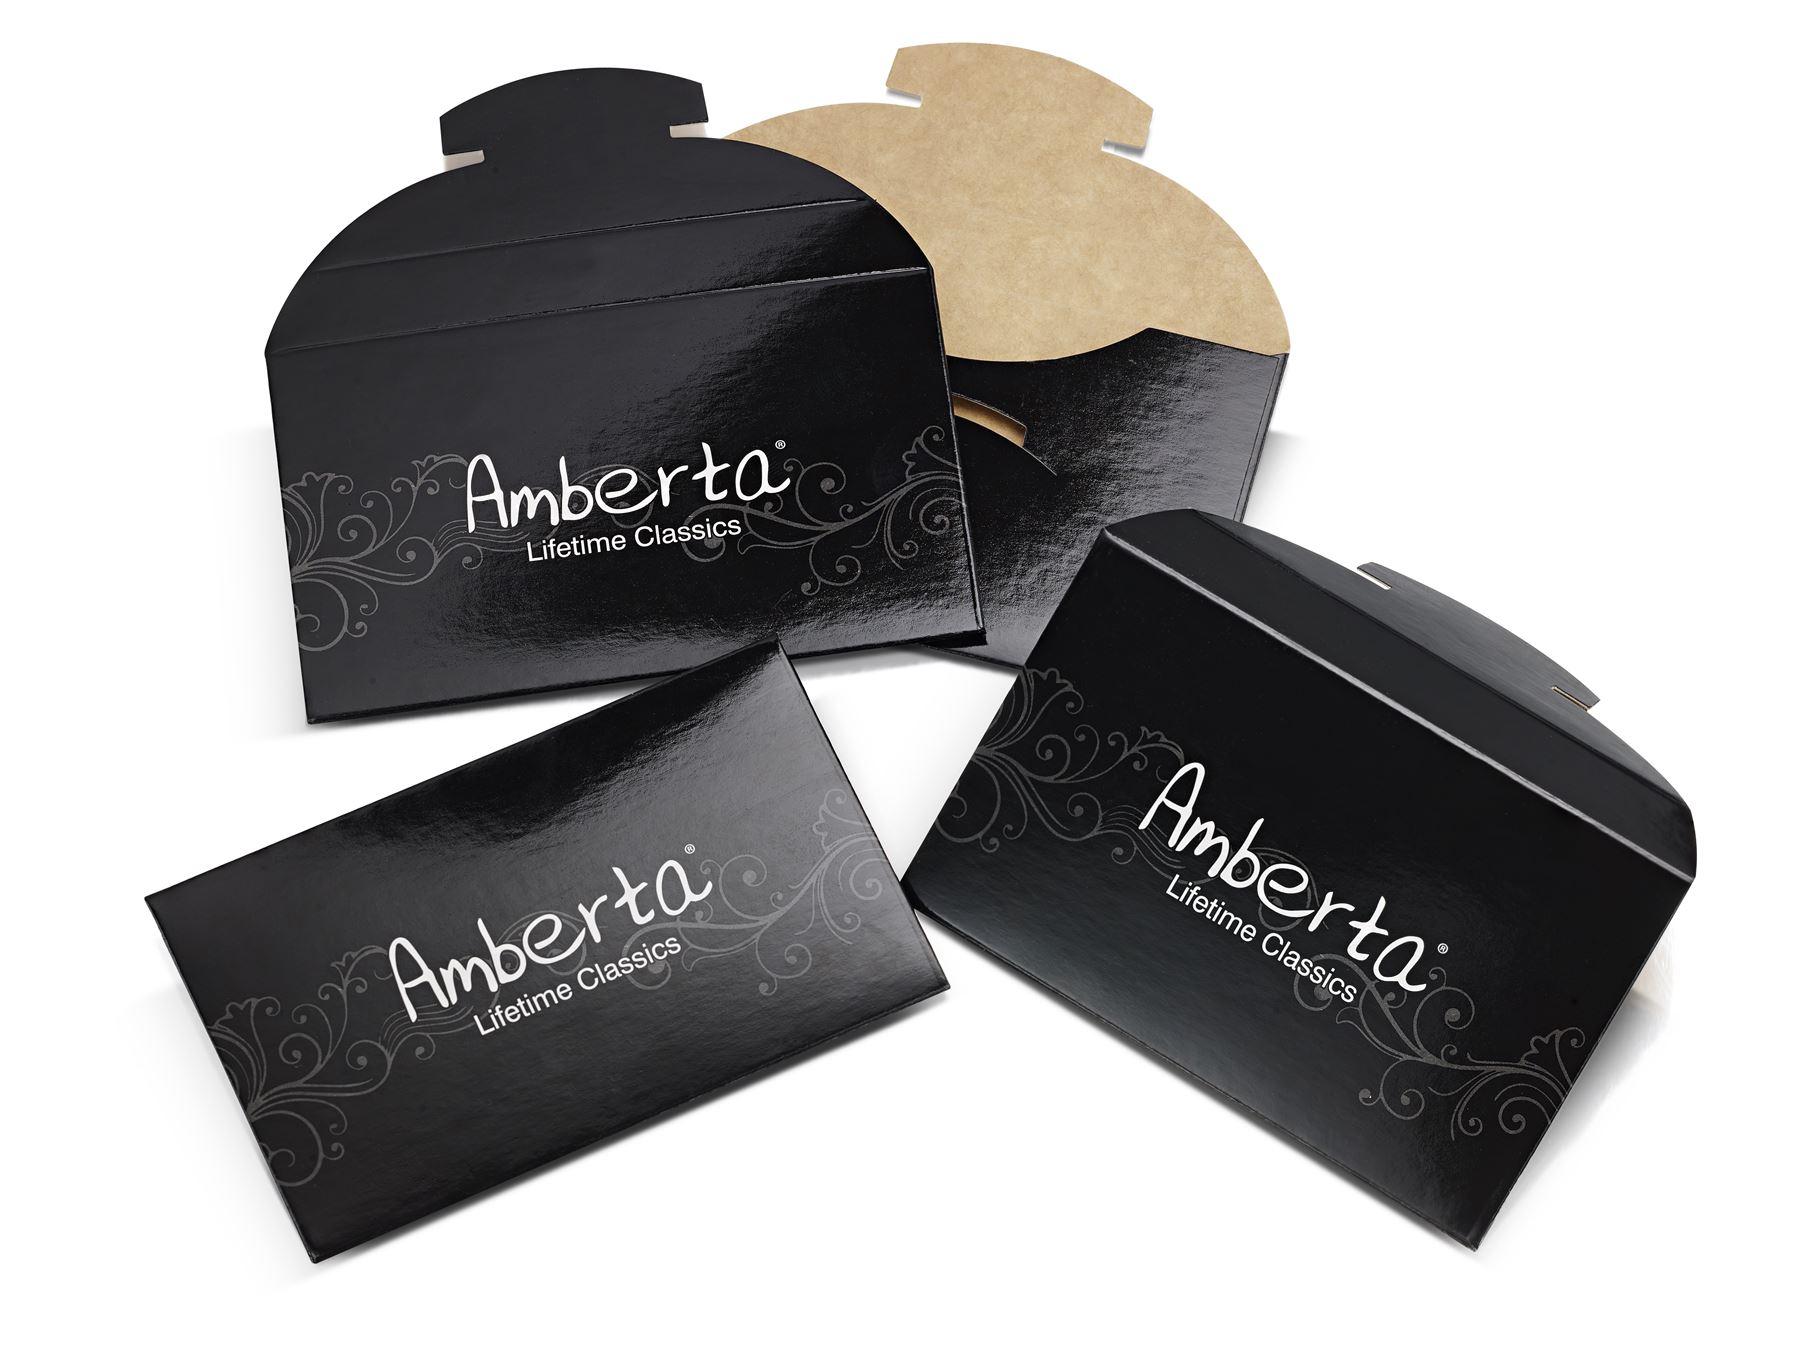 Amberta-Jewelry-925-Sterling-Silver-Adjustable-Bracelet-Italian-Bangle-for-Women miniature 28